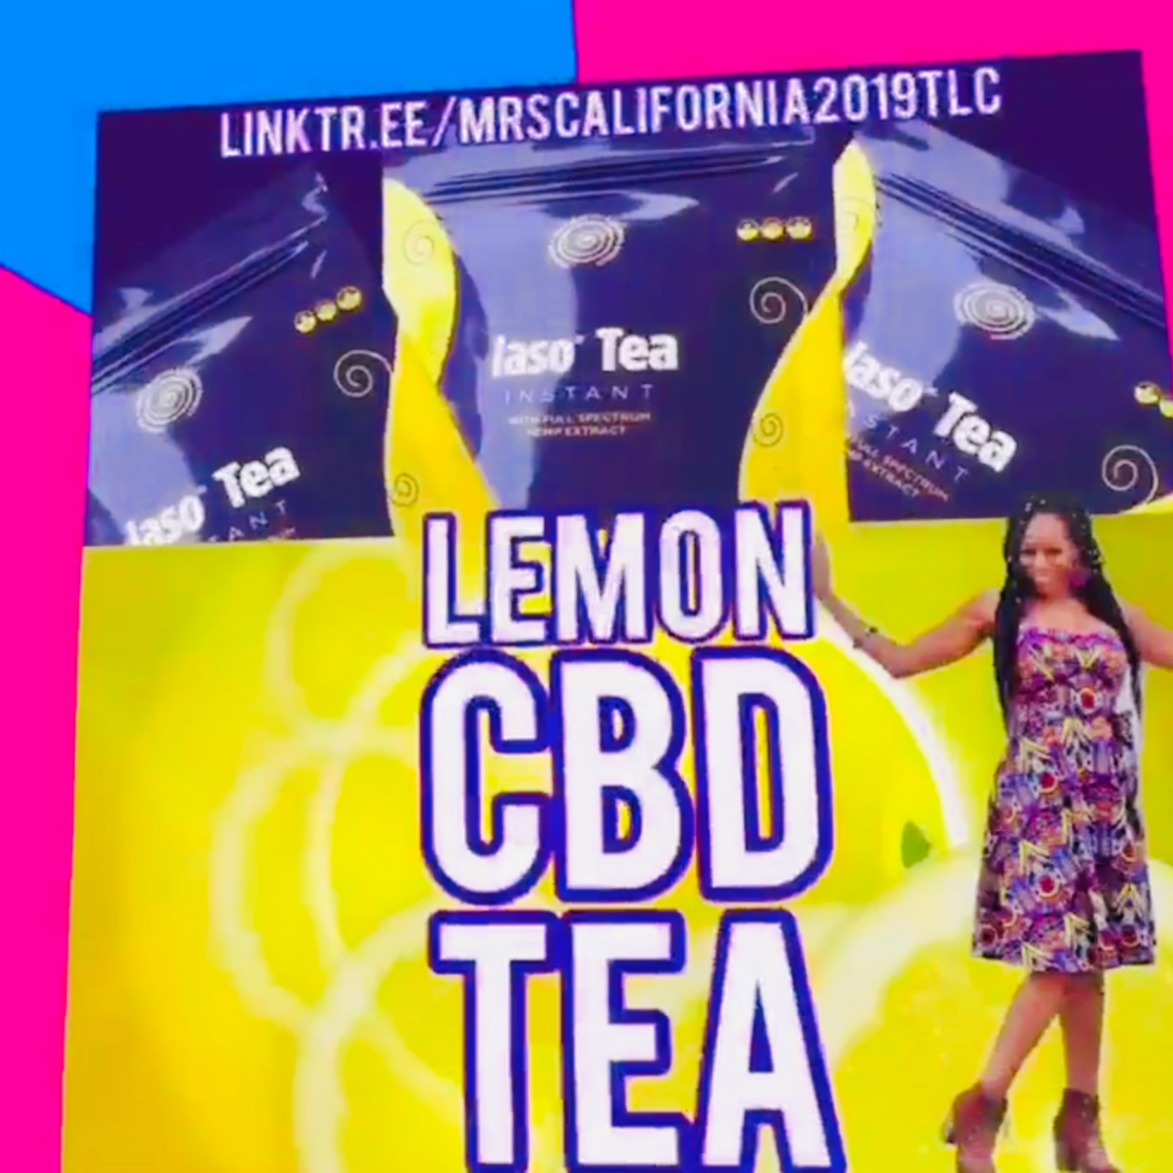 5 Lbs in 5 Days: Lemon CBD Detox Tea